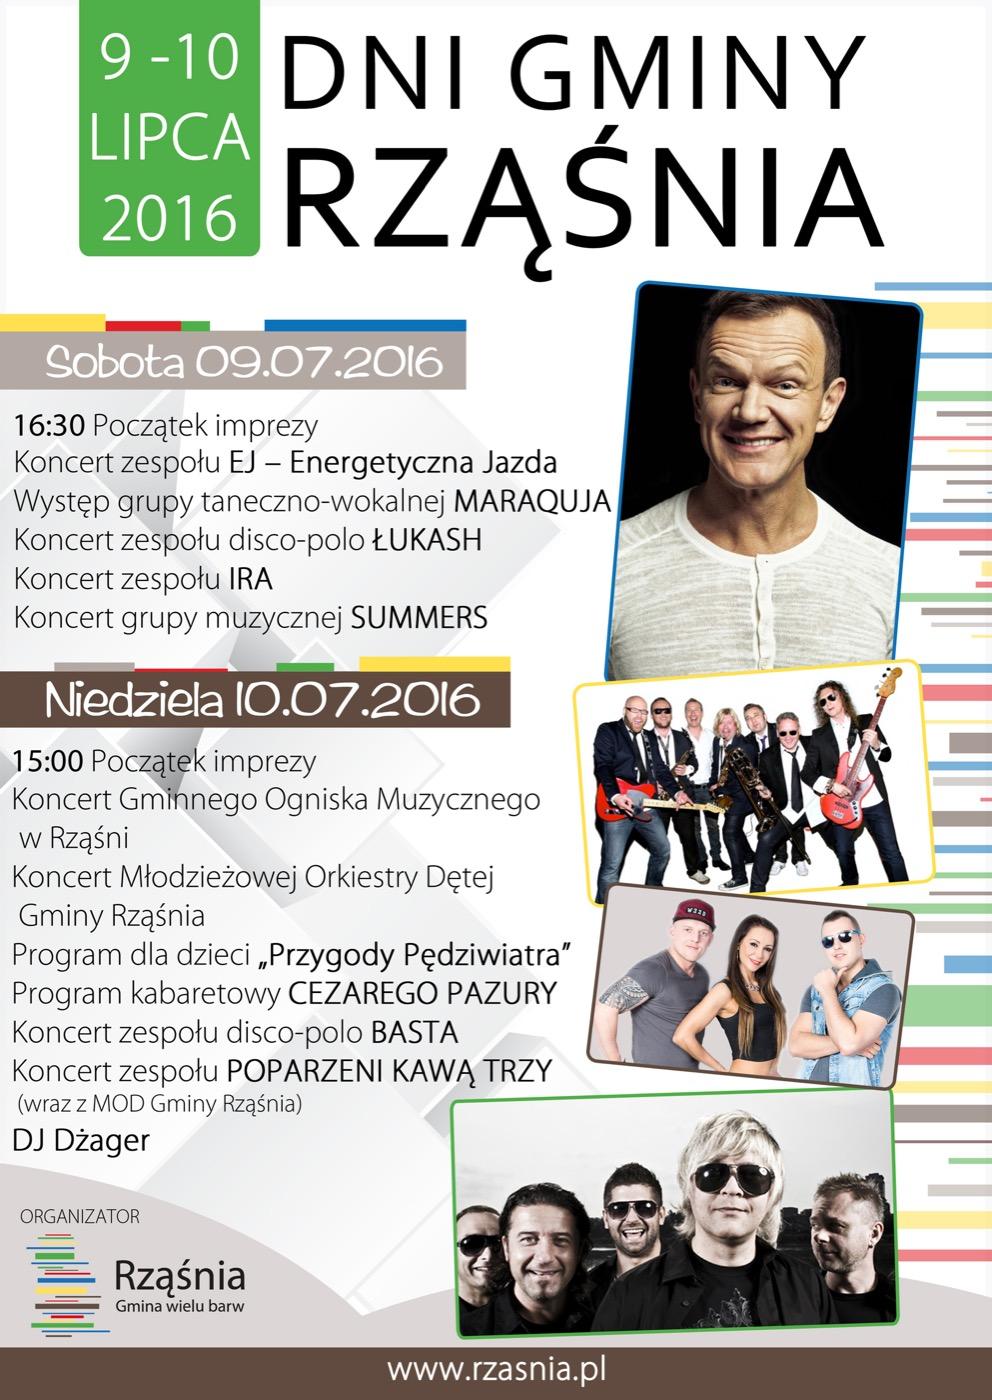 plakat_dni_gminy_rzasnia_2016